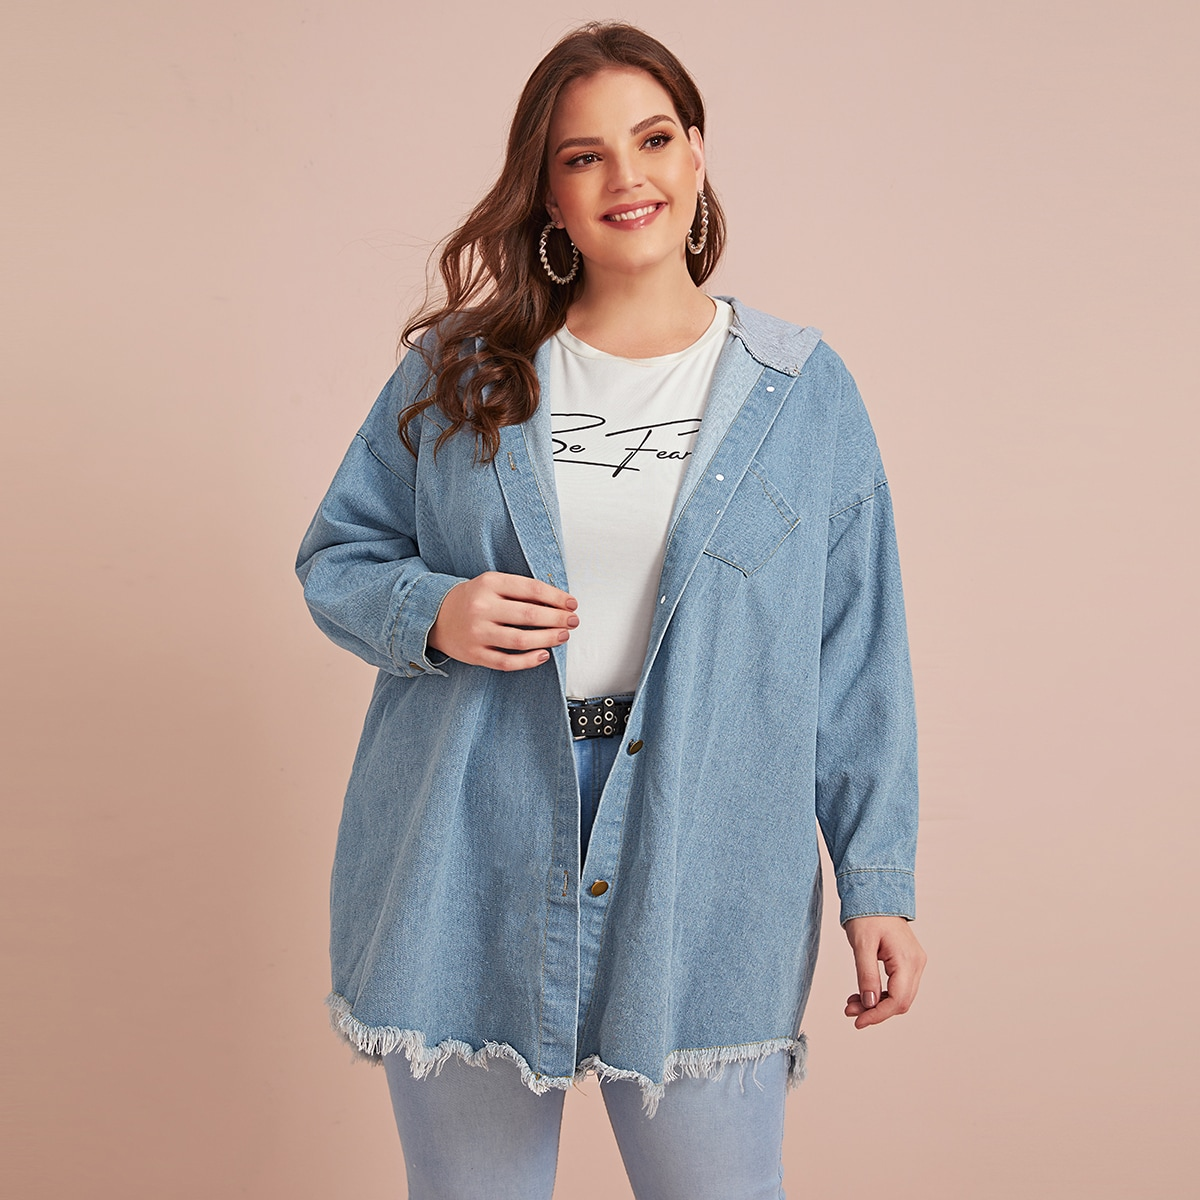 Blauw Casual Kleurblok Grote maten: jeansjassen Ruwe hem